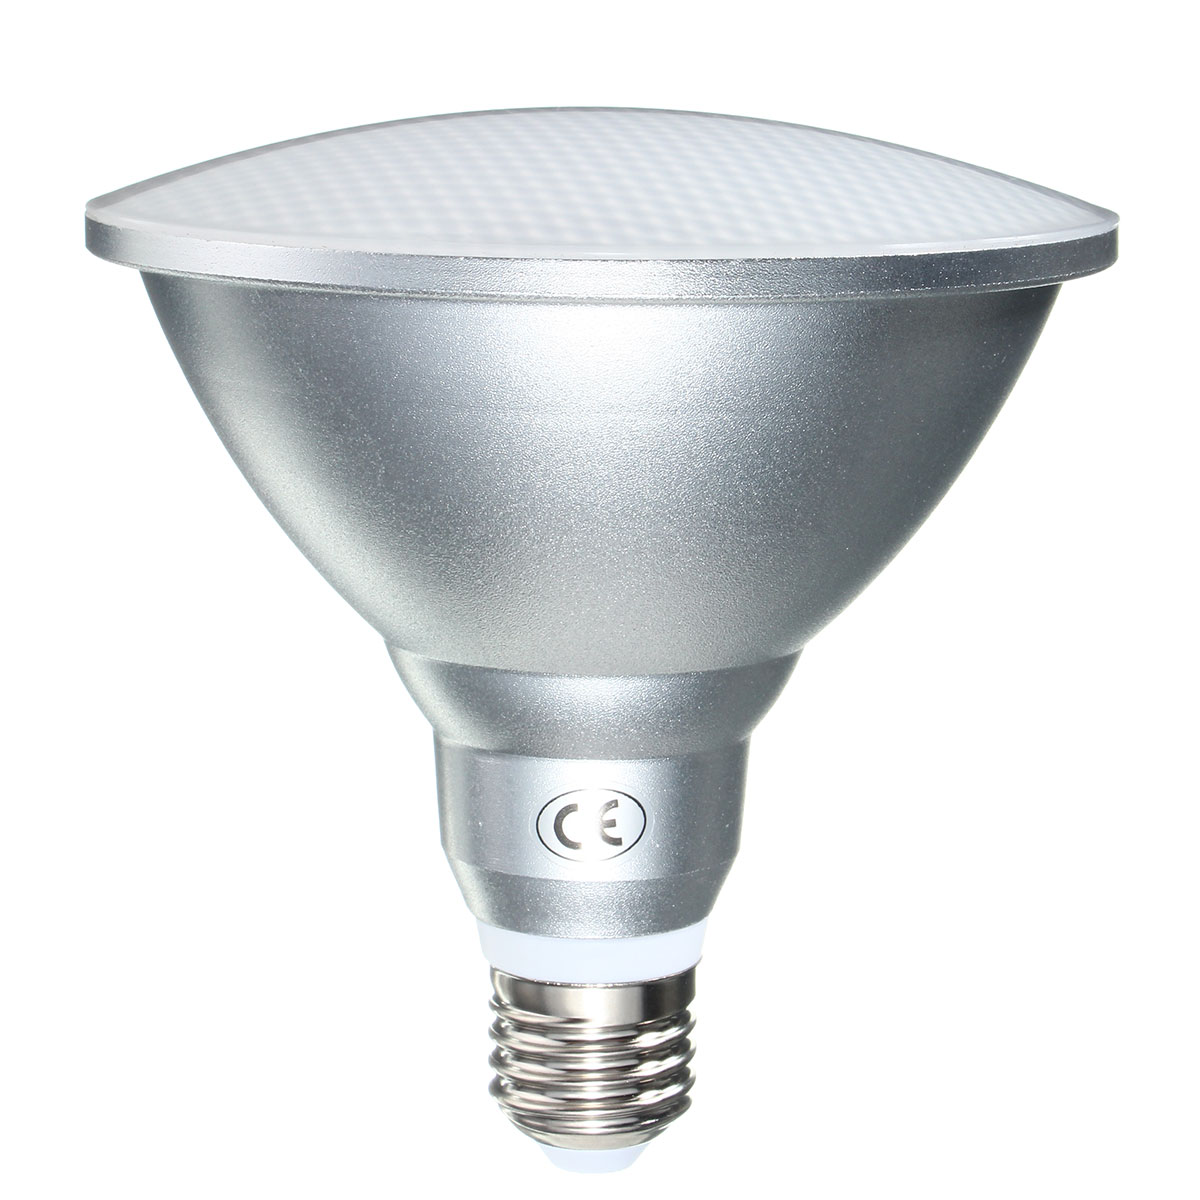 dimmable e27 15w 900lm led spot light bulb par38 ip65 lamp white warm white natural white ac220v. Black Bedroom Furniture Sets. Home Design Ideas